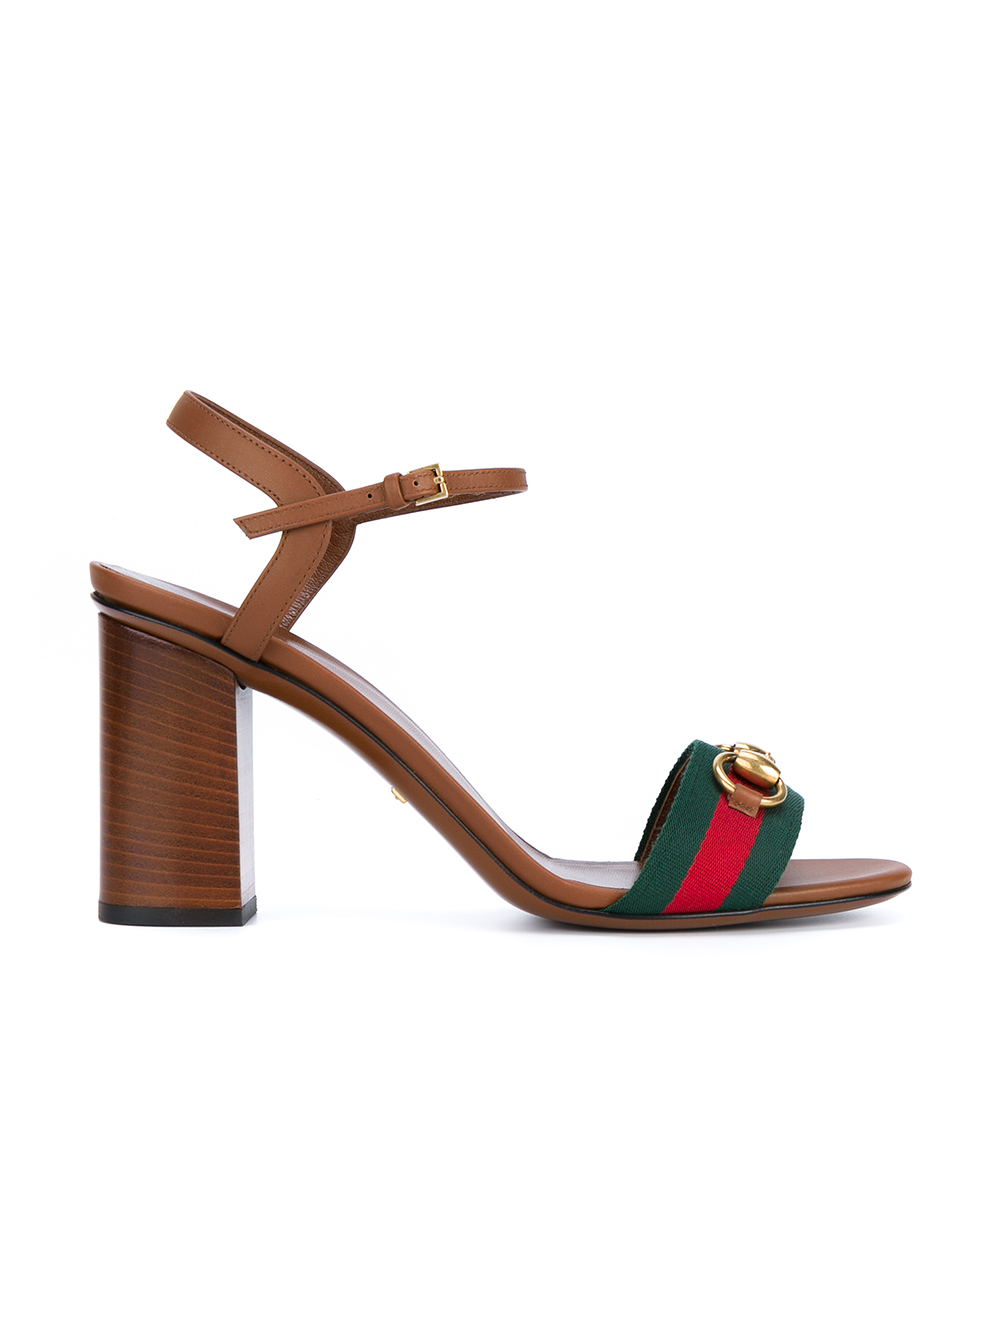 2062f6f5a Gucci Leather Block Heel Sandals in Orange - Lyst